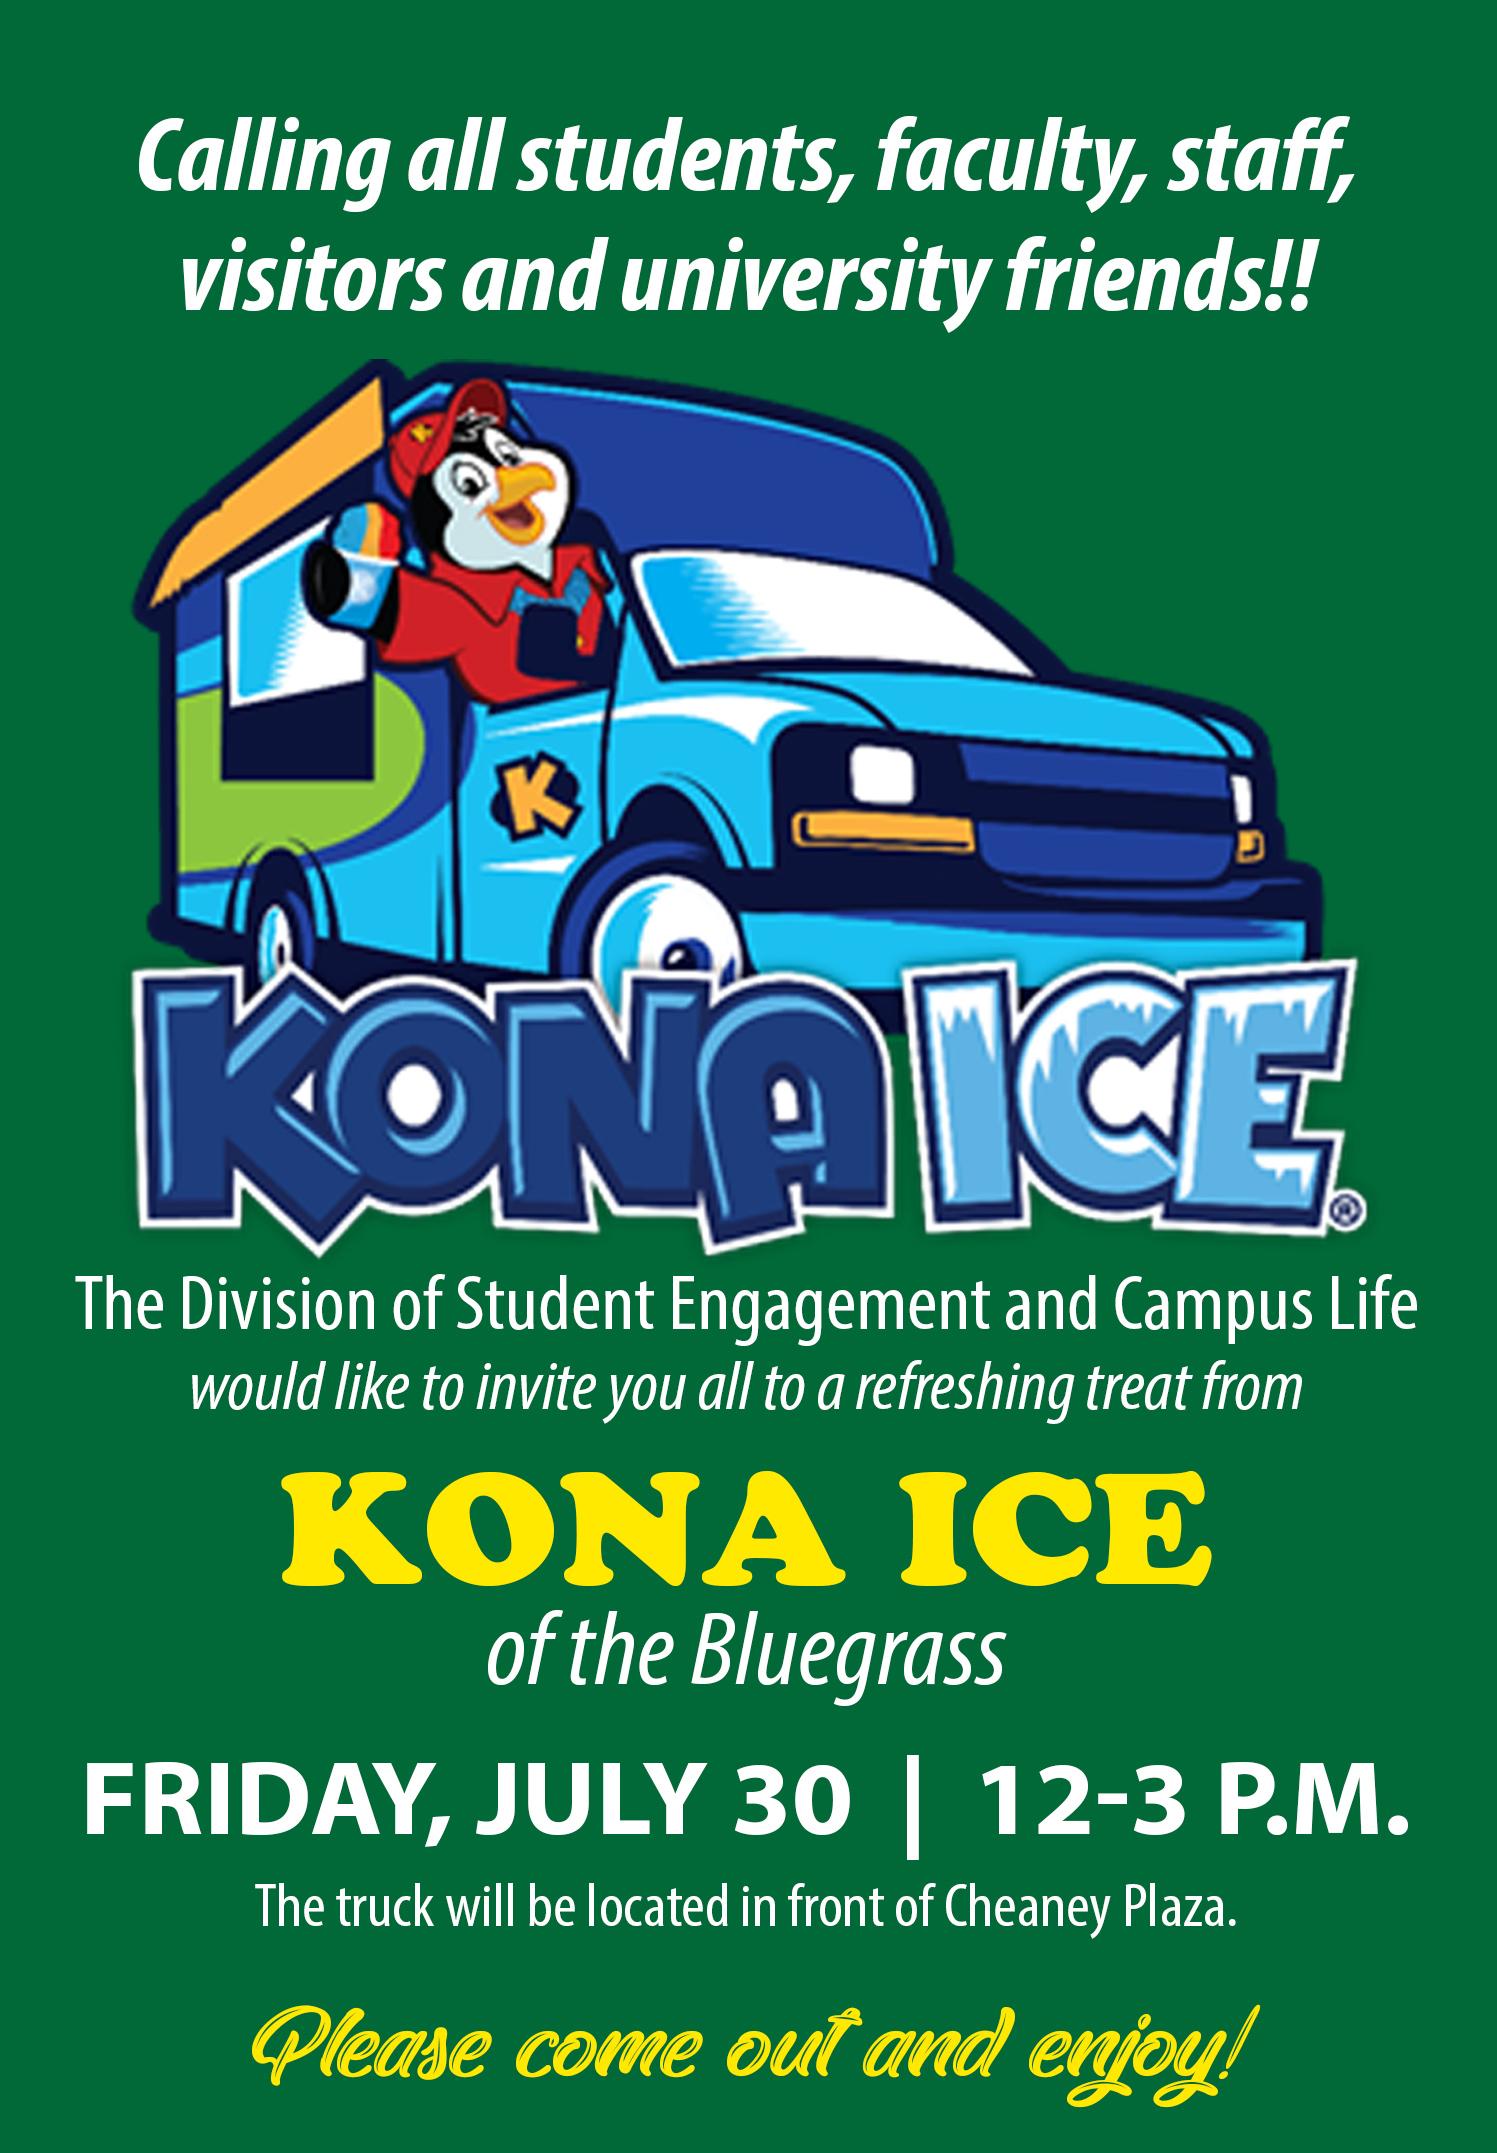 Kona Ice of the Bluegrass